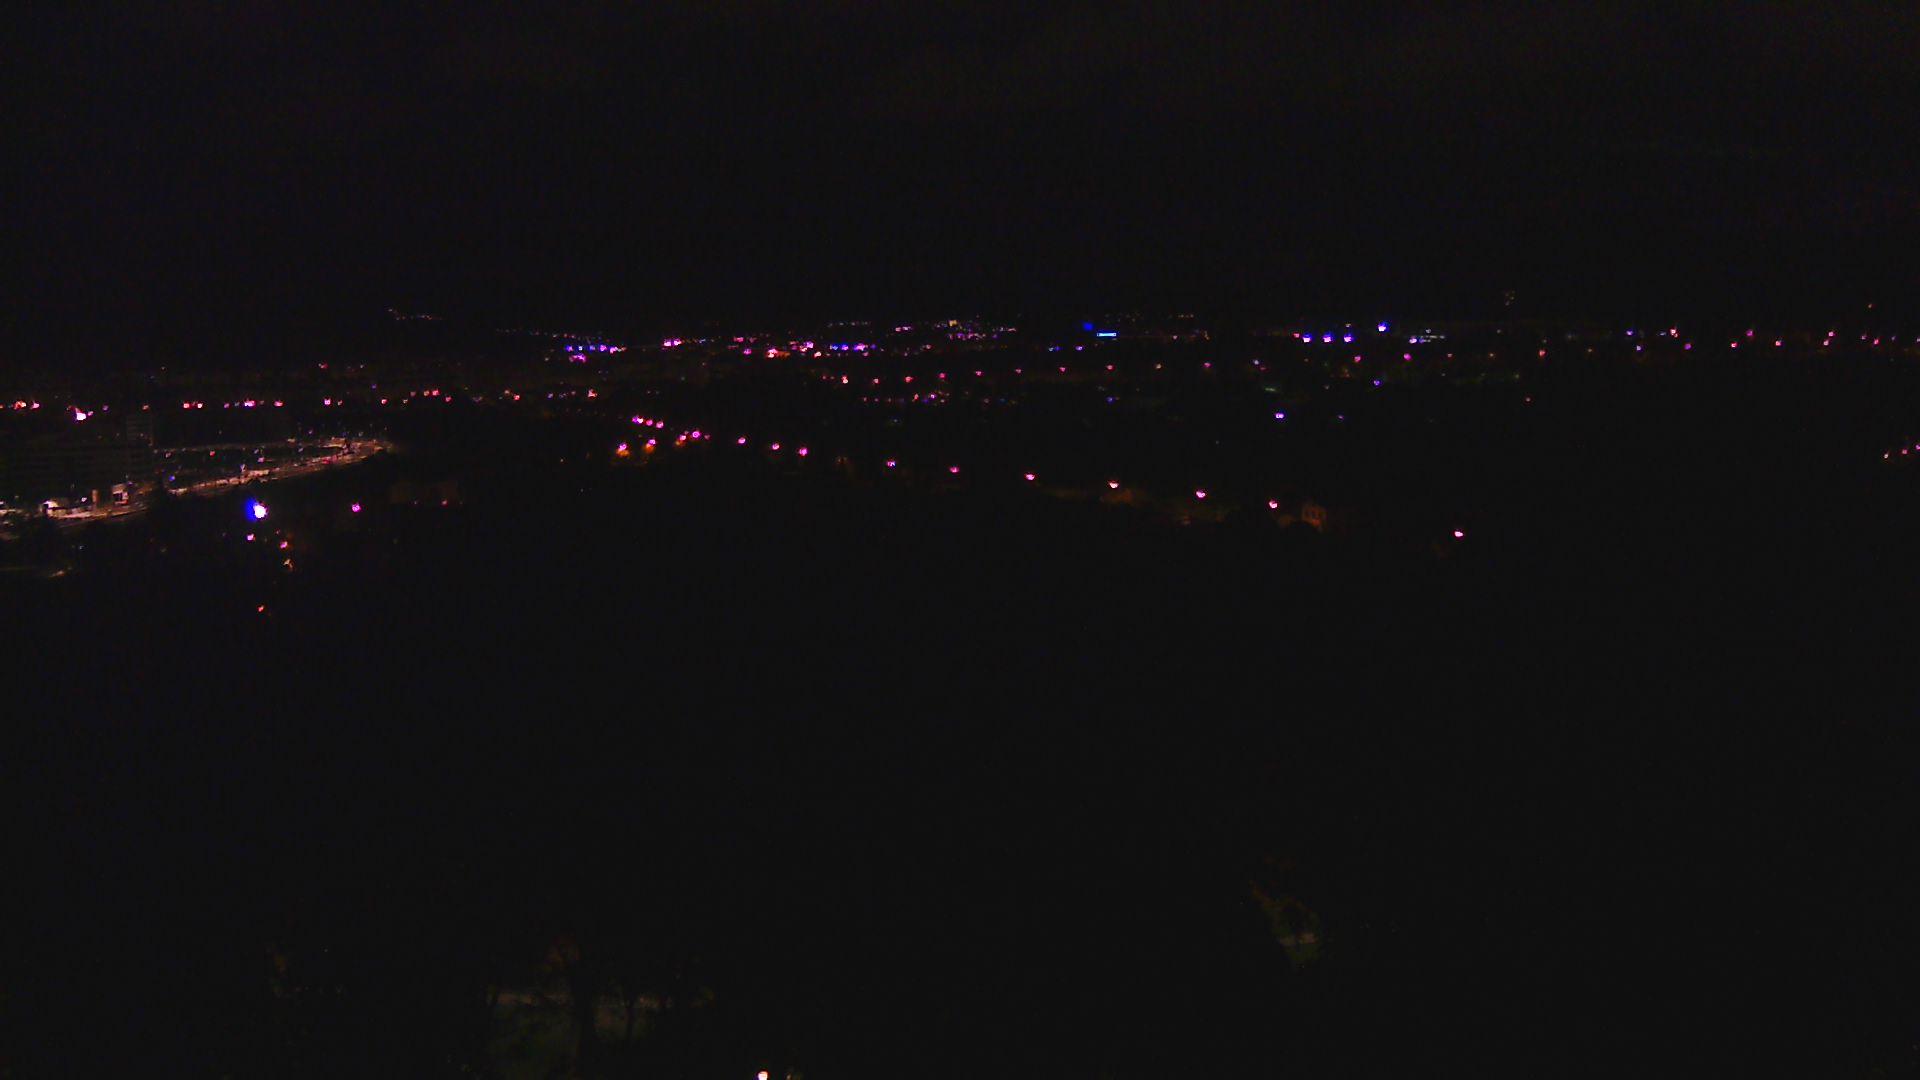 Pamplona So. 23:46